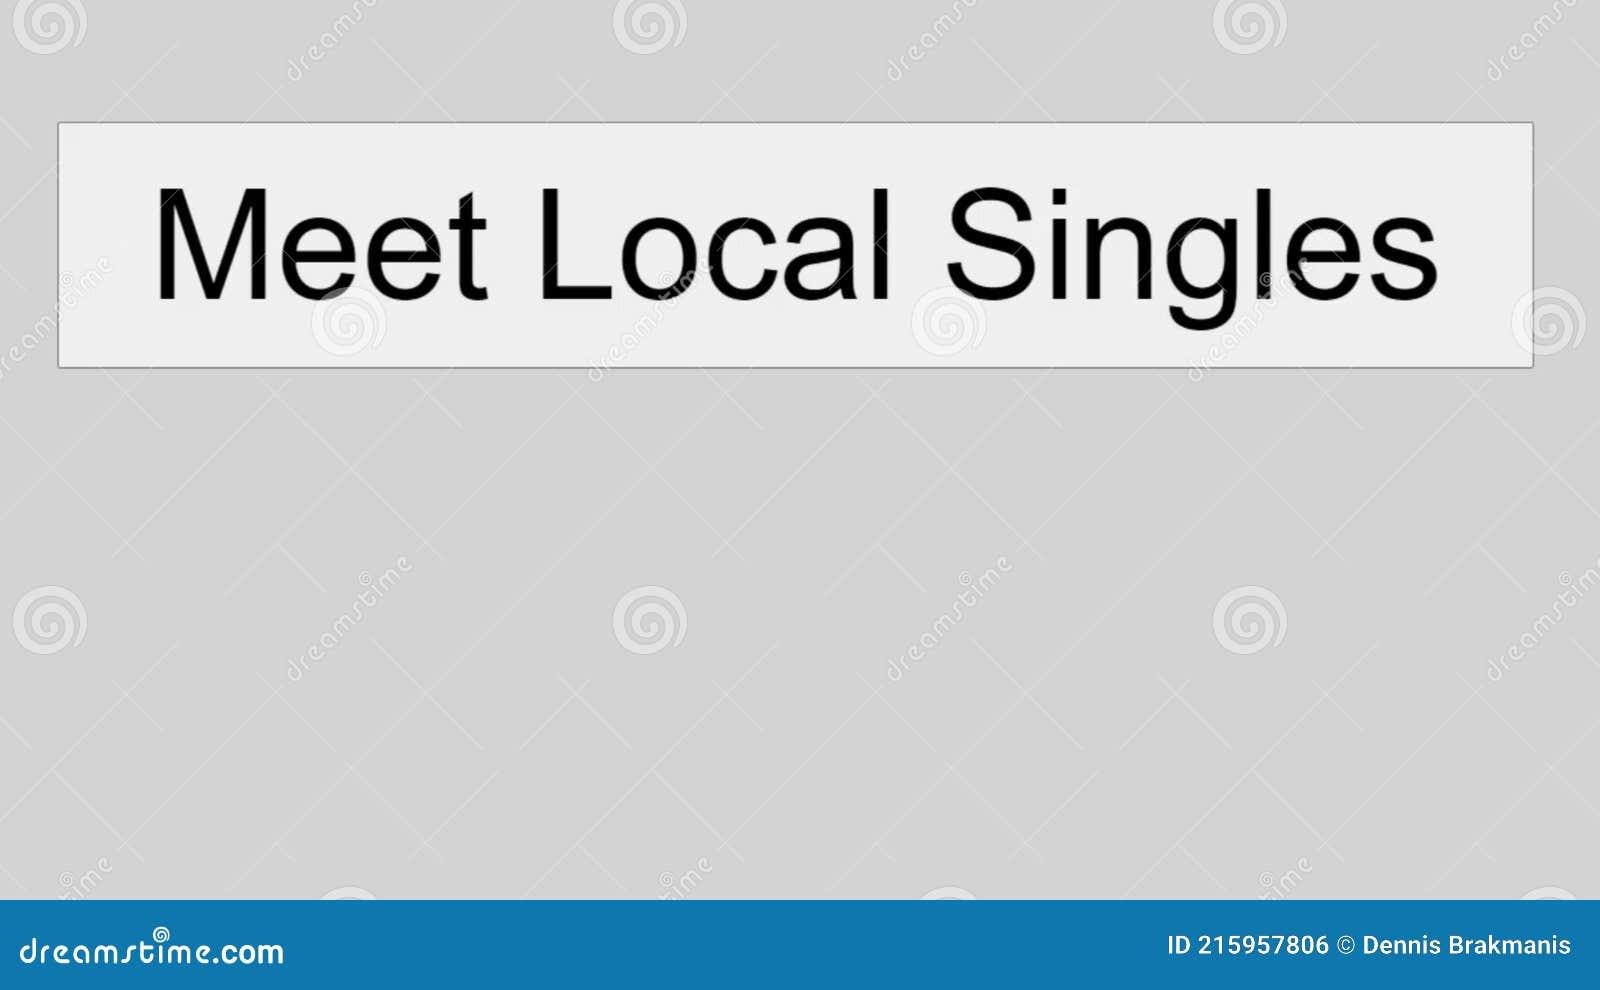 Where to meet local singles